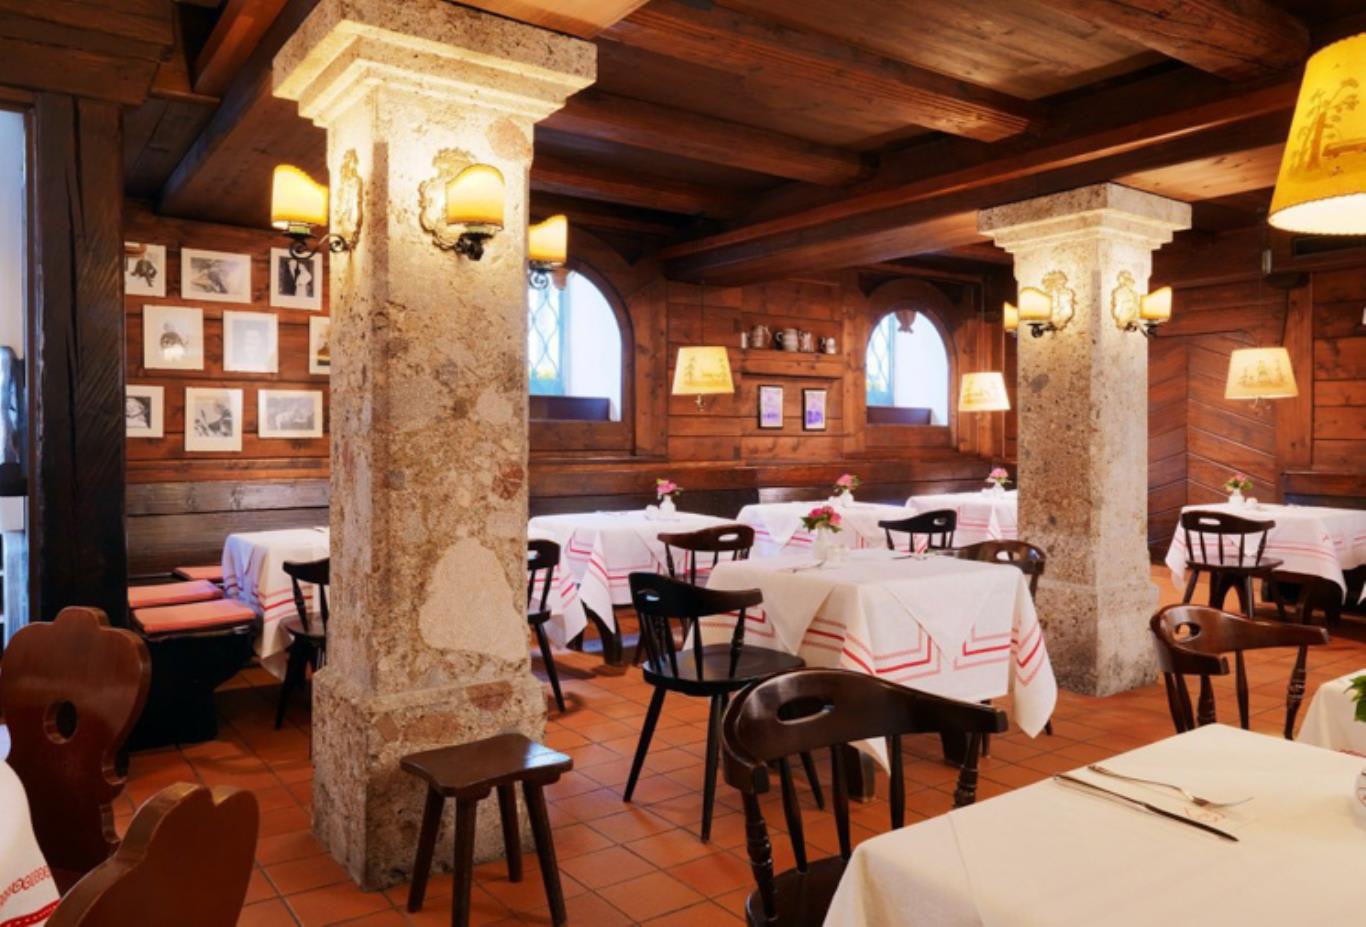 Restaurant-Sherzl